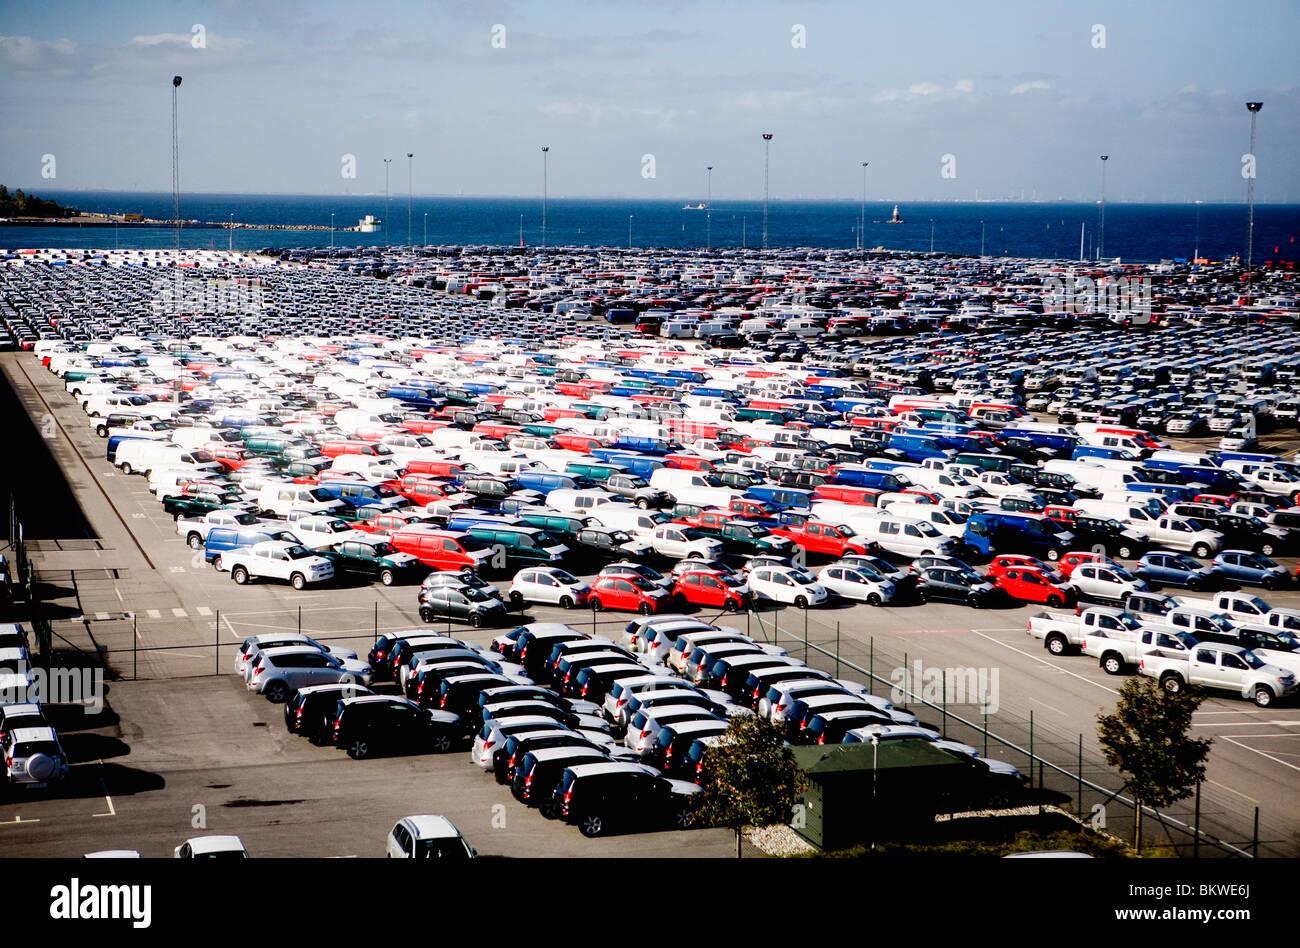 A enormous parking lot - Stock Image